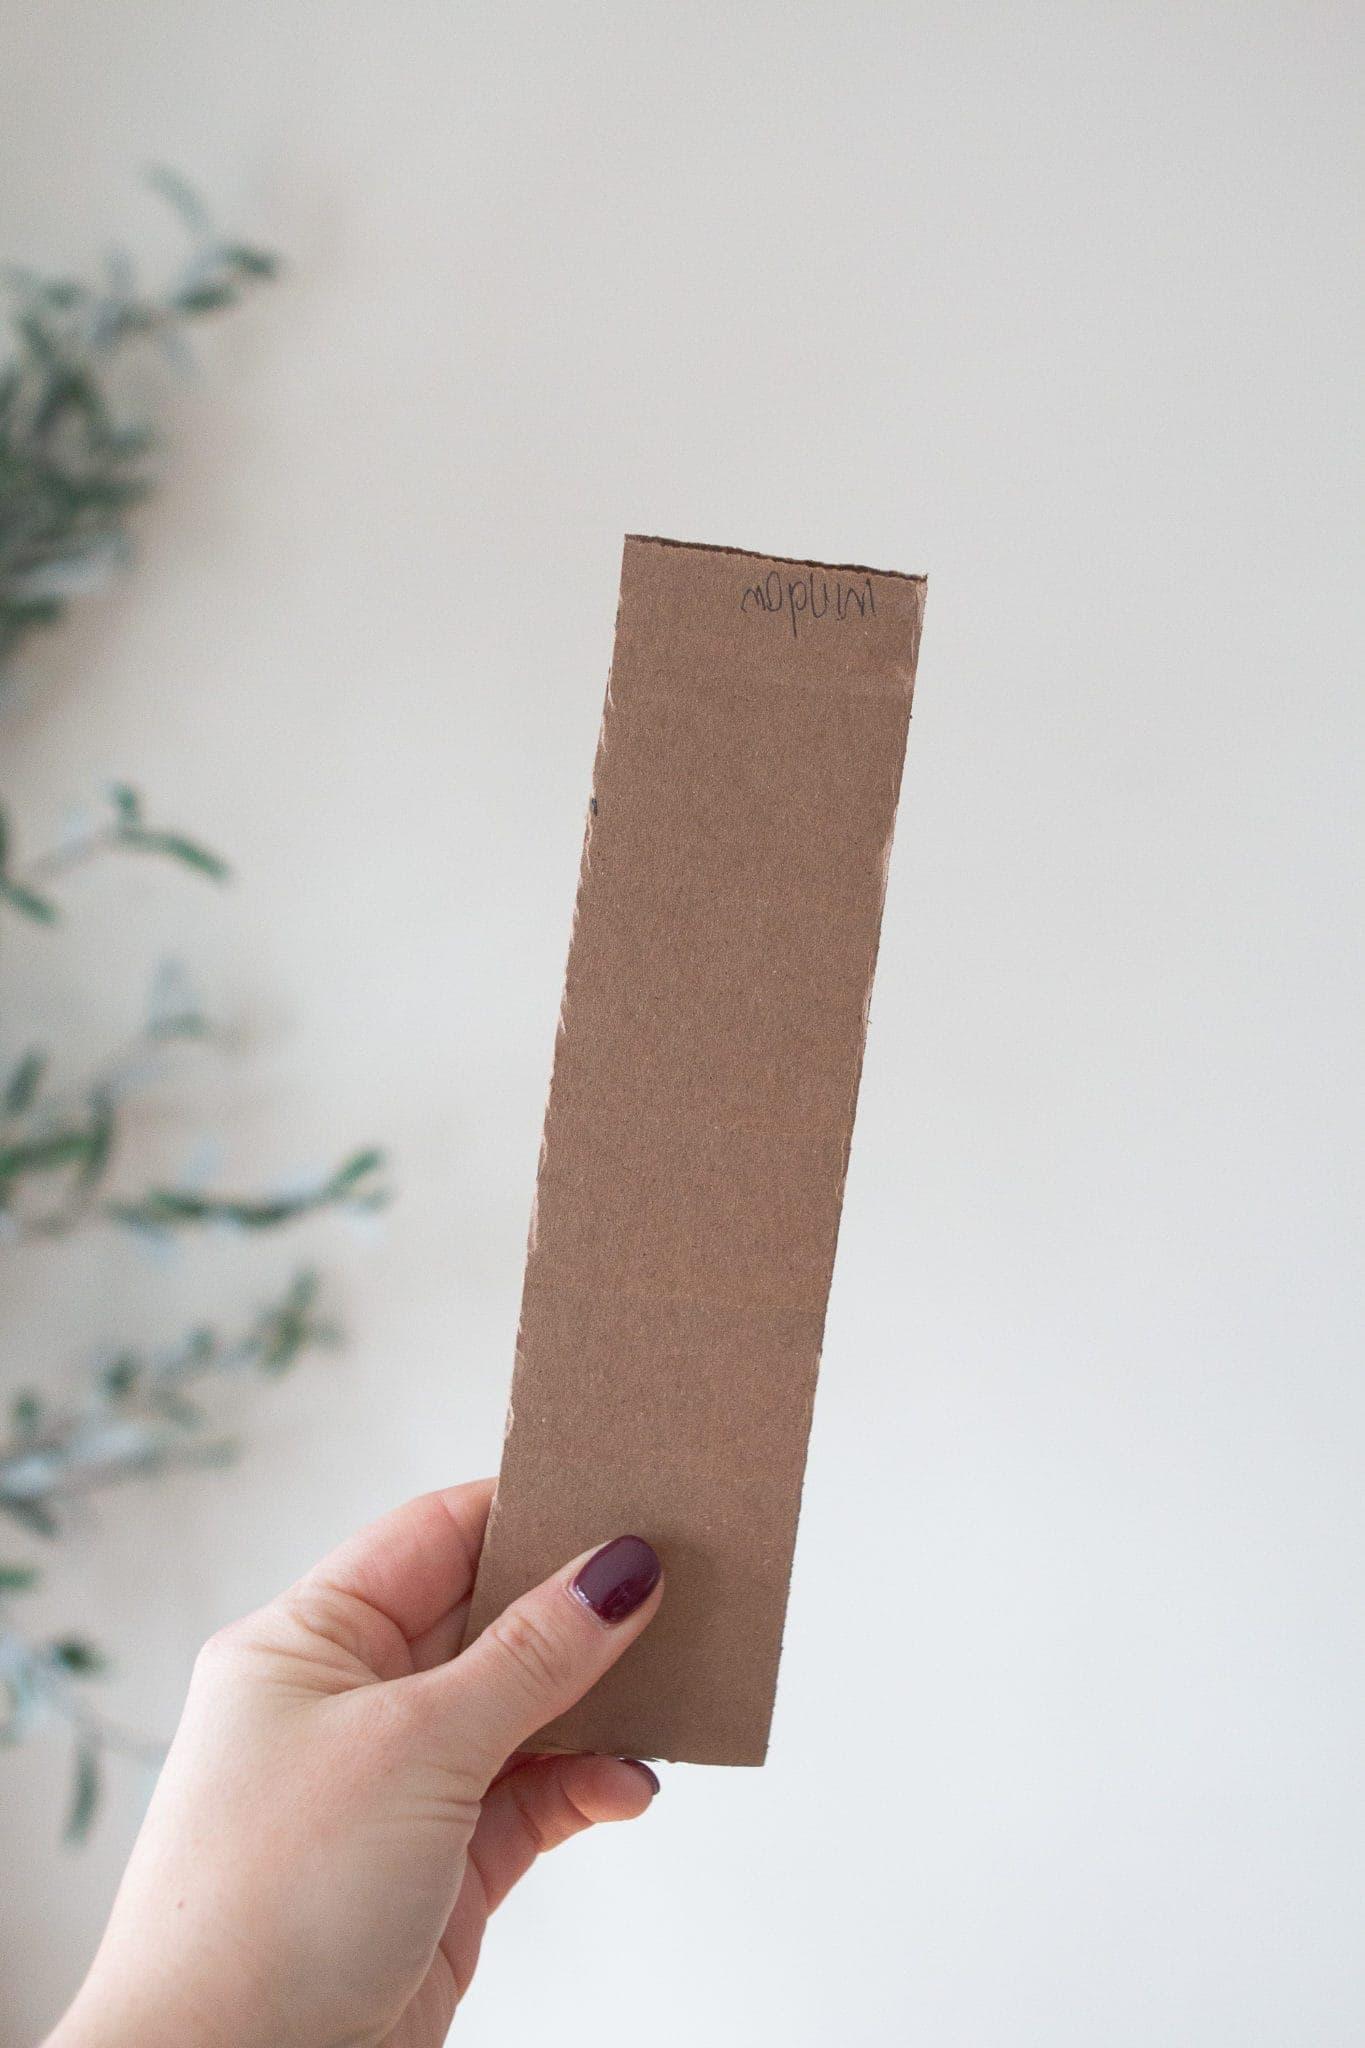 Make a template using cardboard